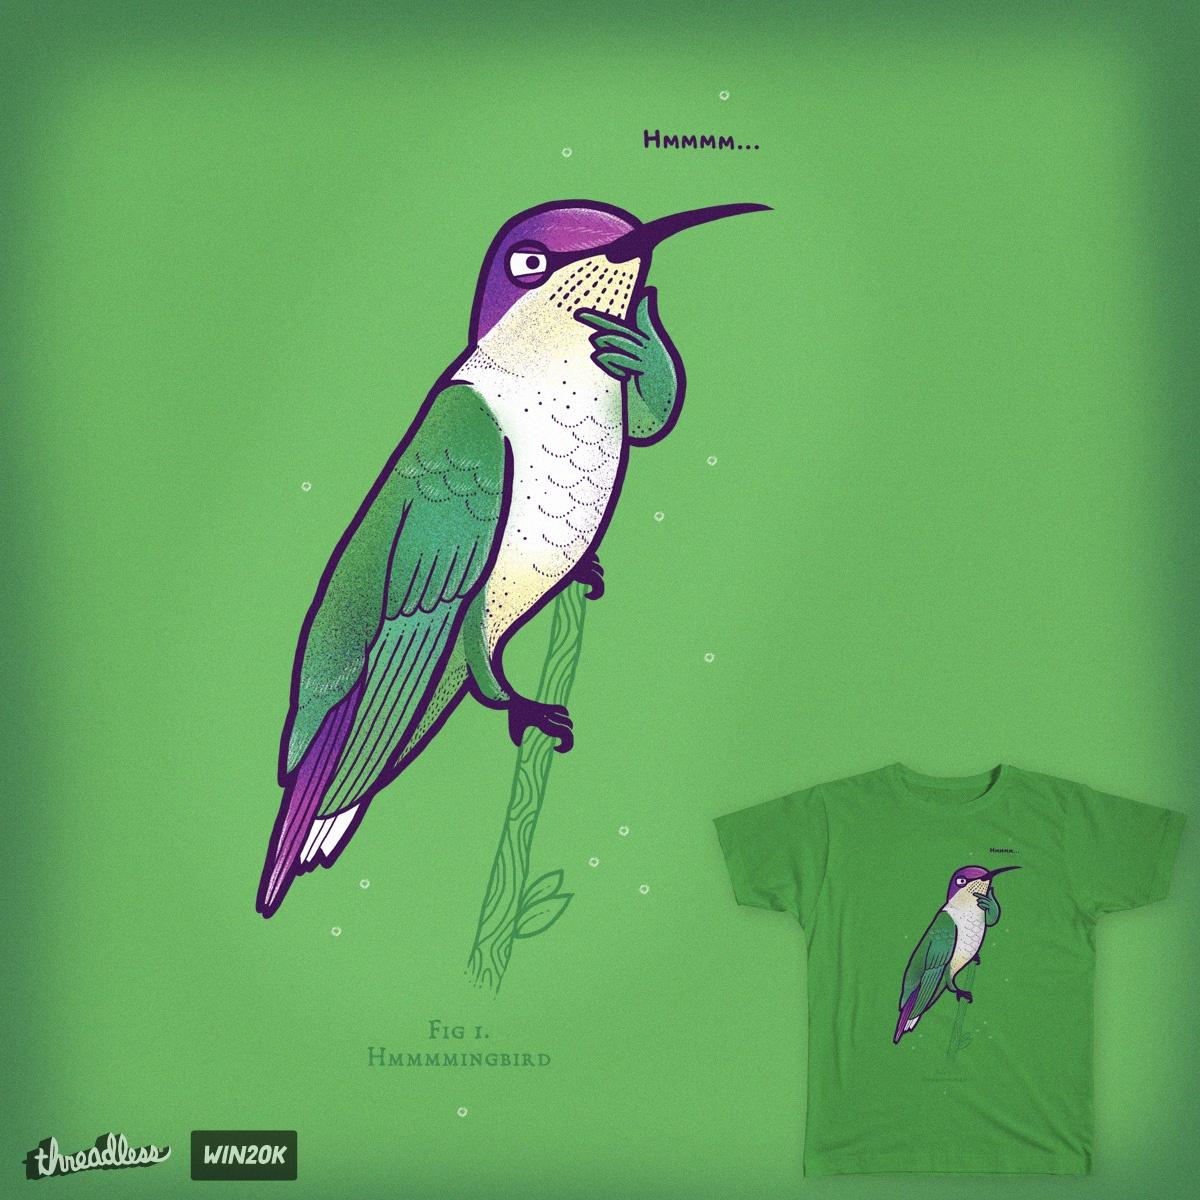 Hmmmingbird by randyotter3000 on Threadless